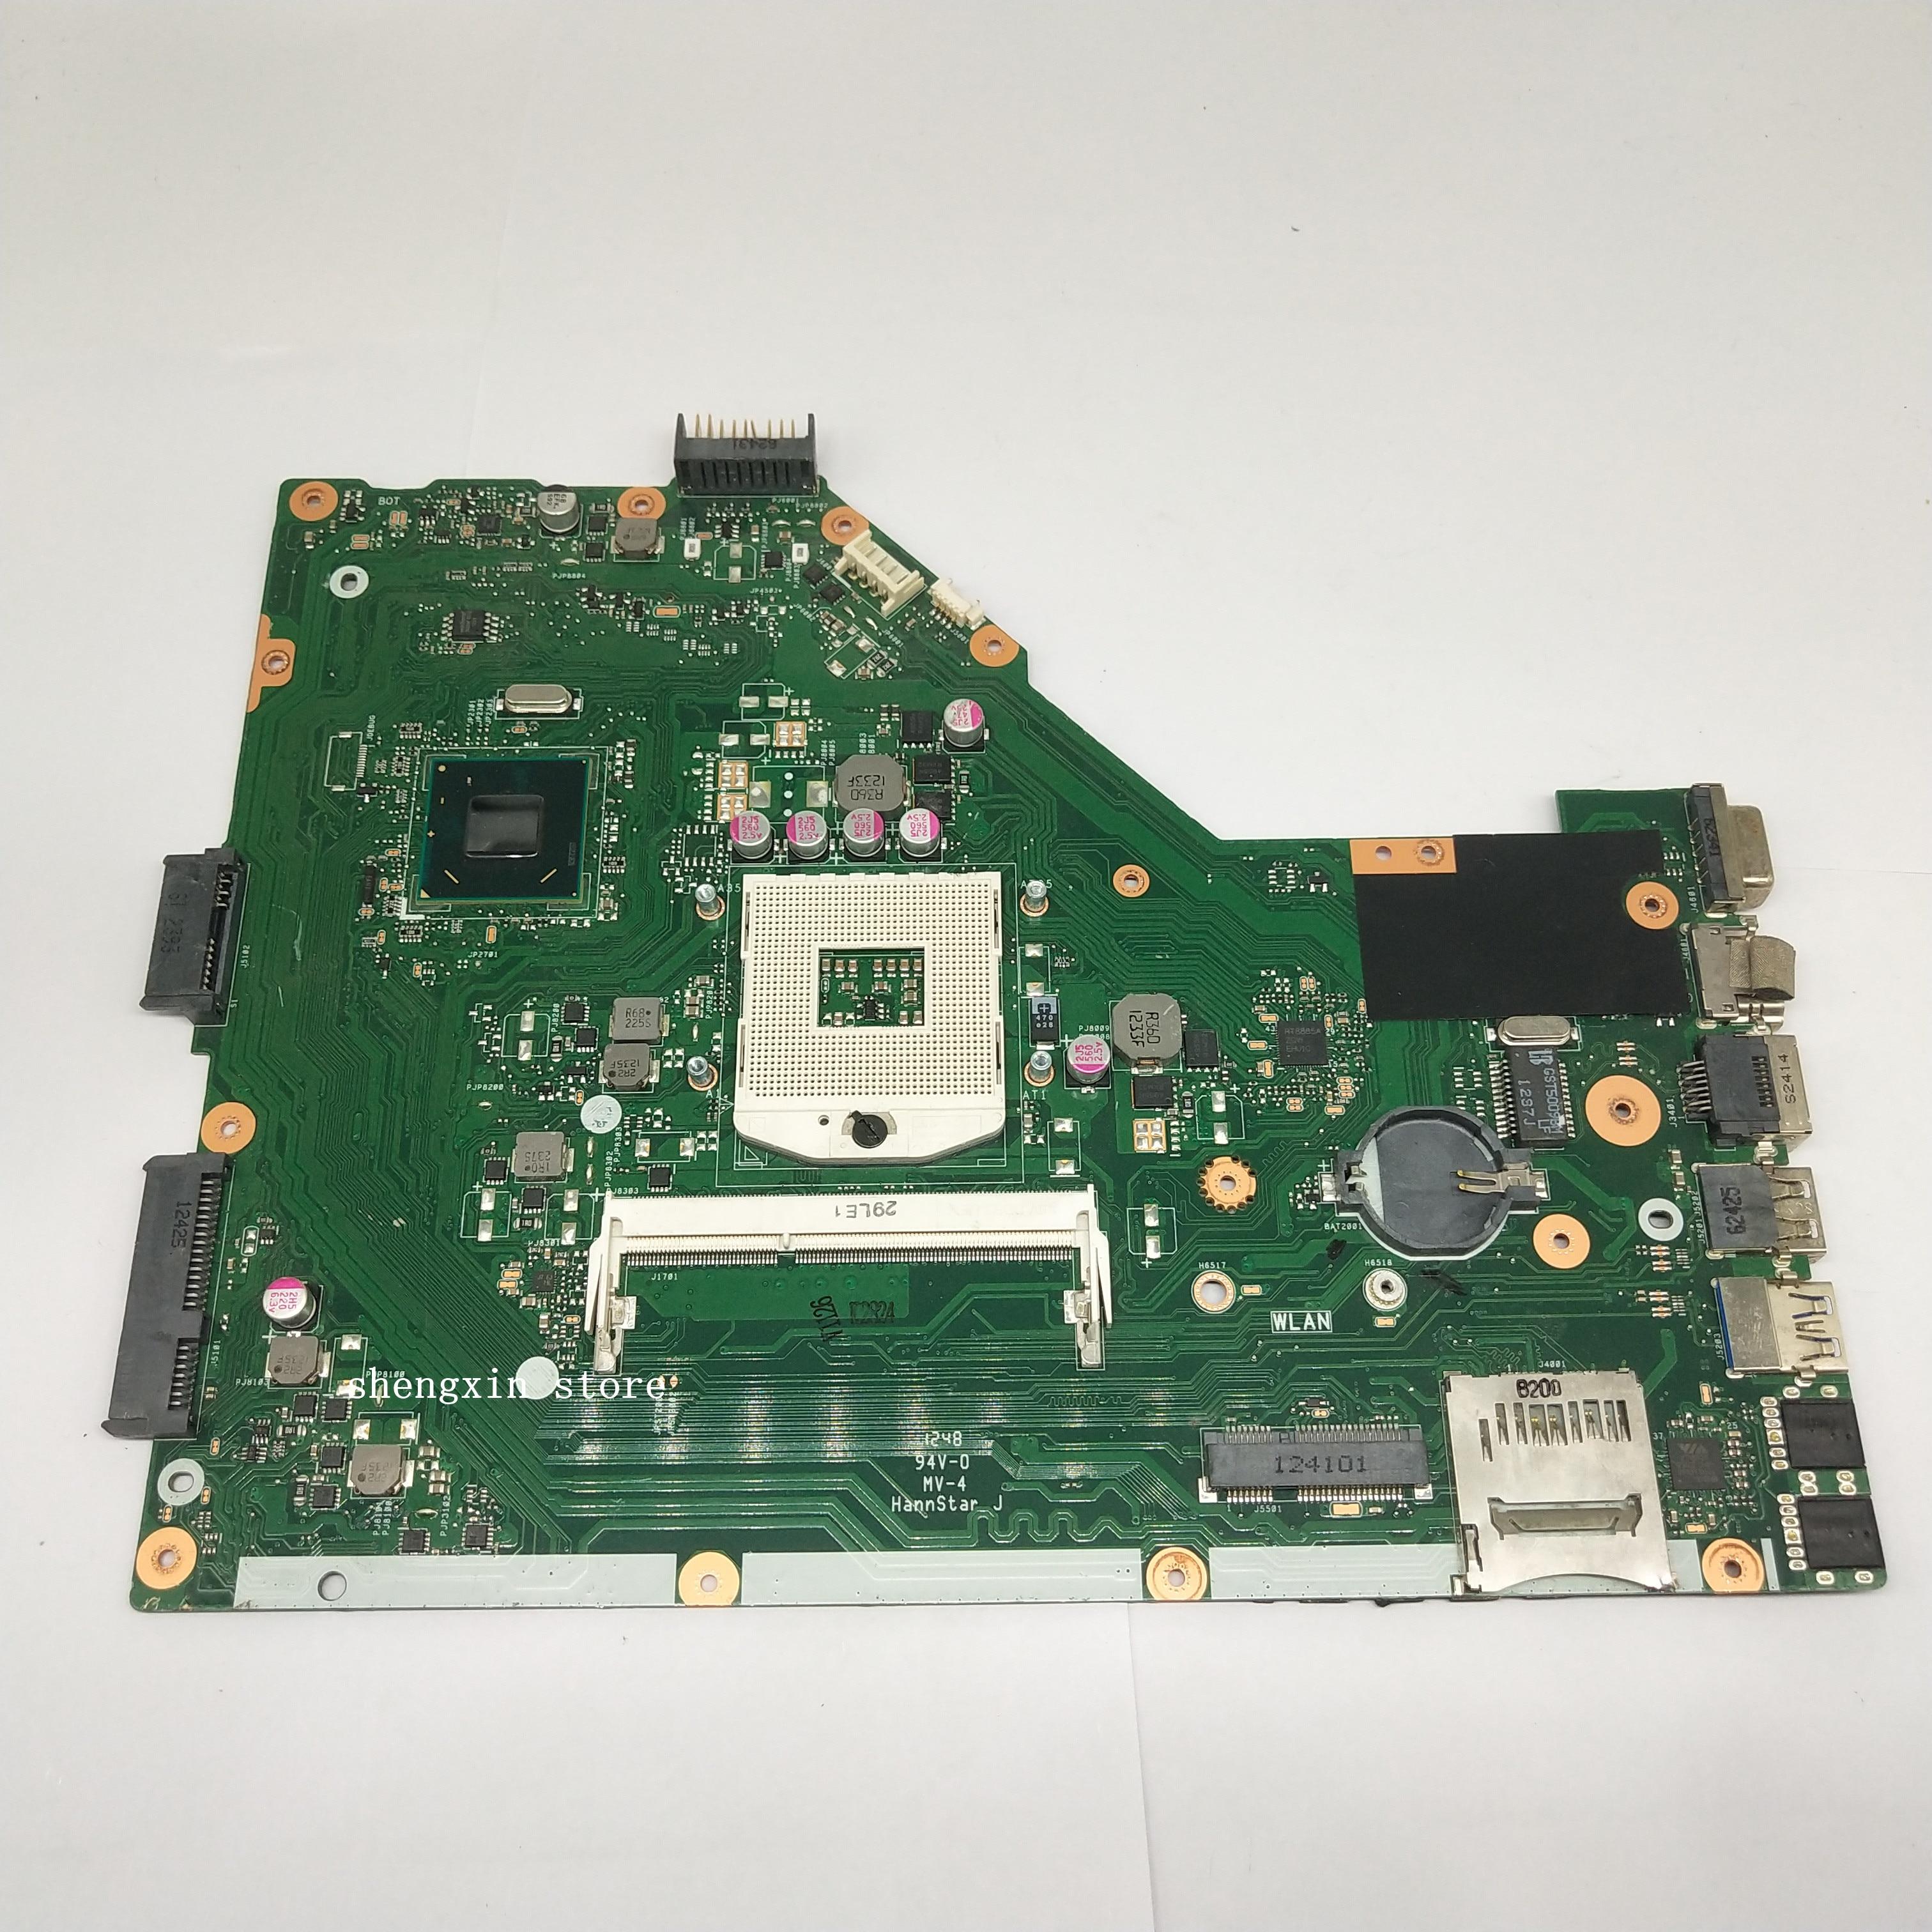 Para ASUS X55A placa madre del cuaderno HM70 REV 2,1/2,2 X55A placa base de computadora portátil prueba 100%